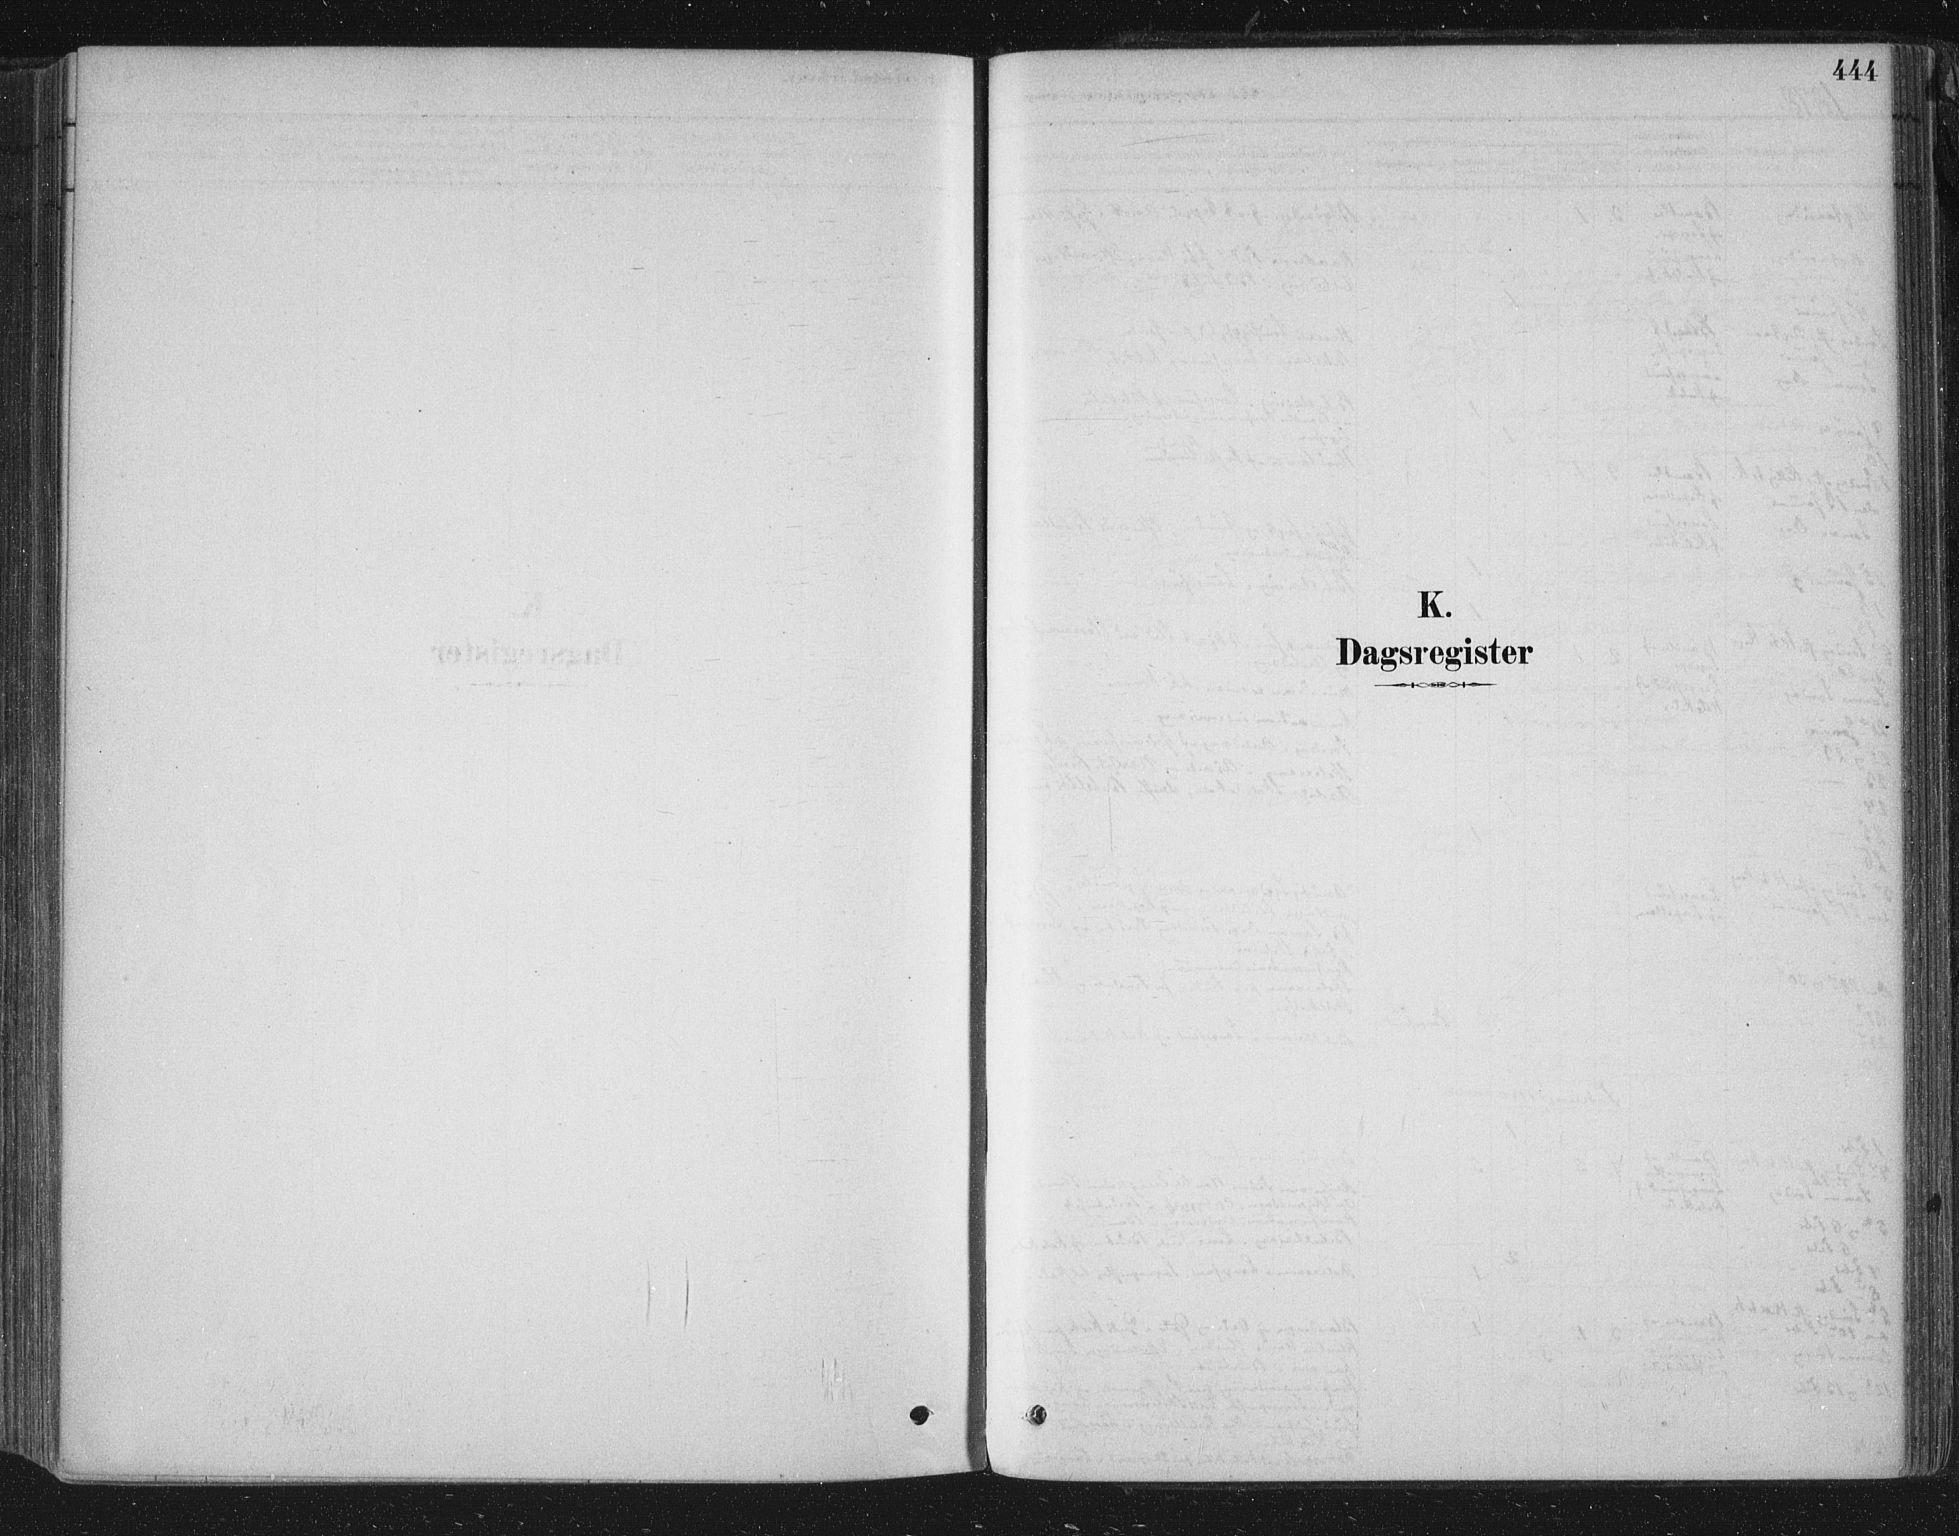 SAKO, Bamble kirkebøker, F/Fa/L0007: Ministerialbok nr. I 7, 1878-1888, s. 444